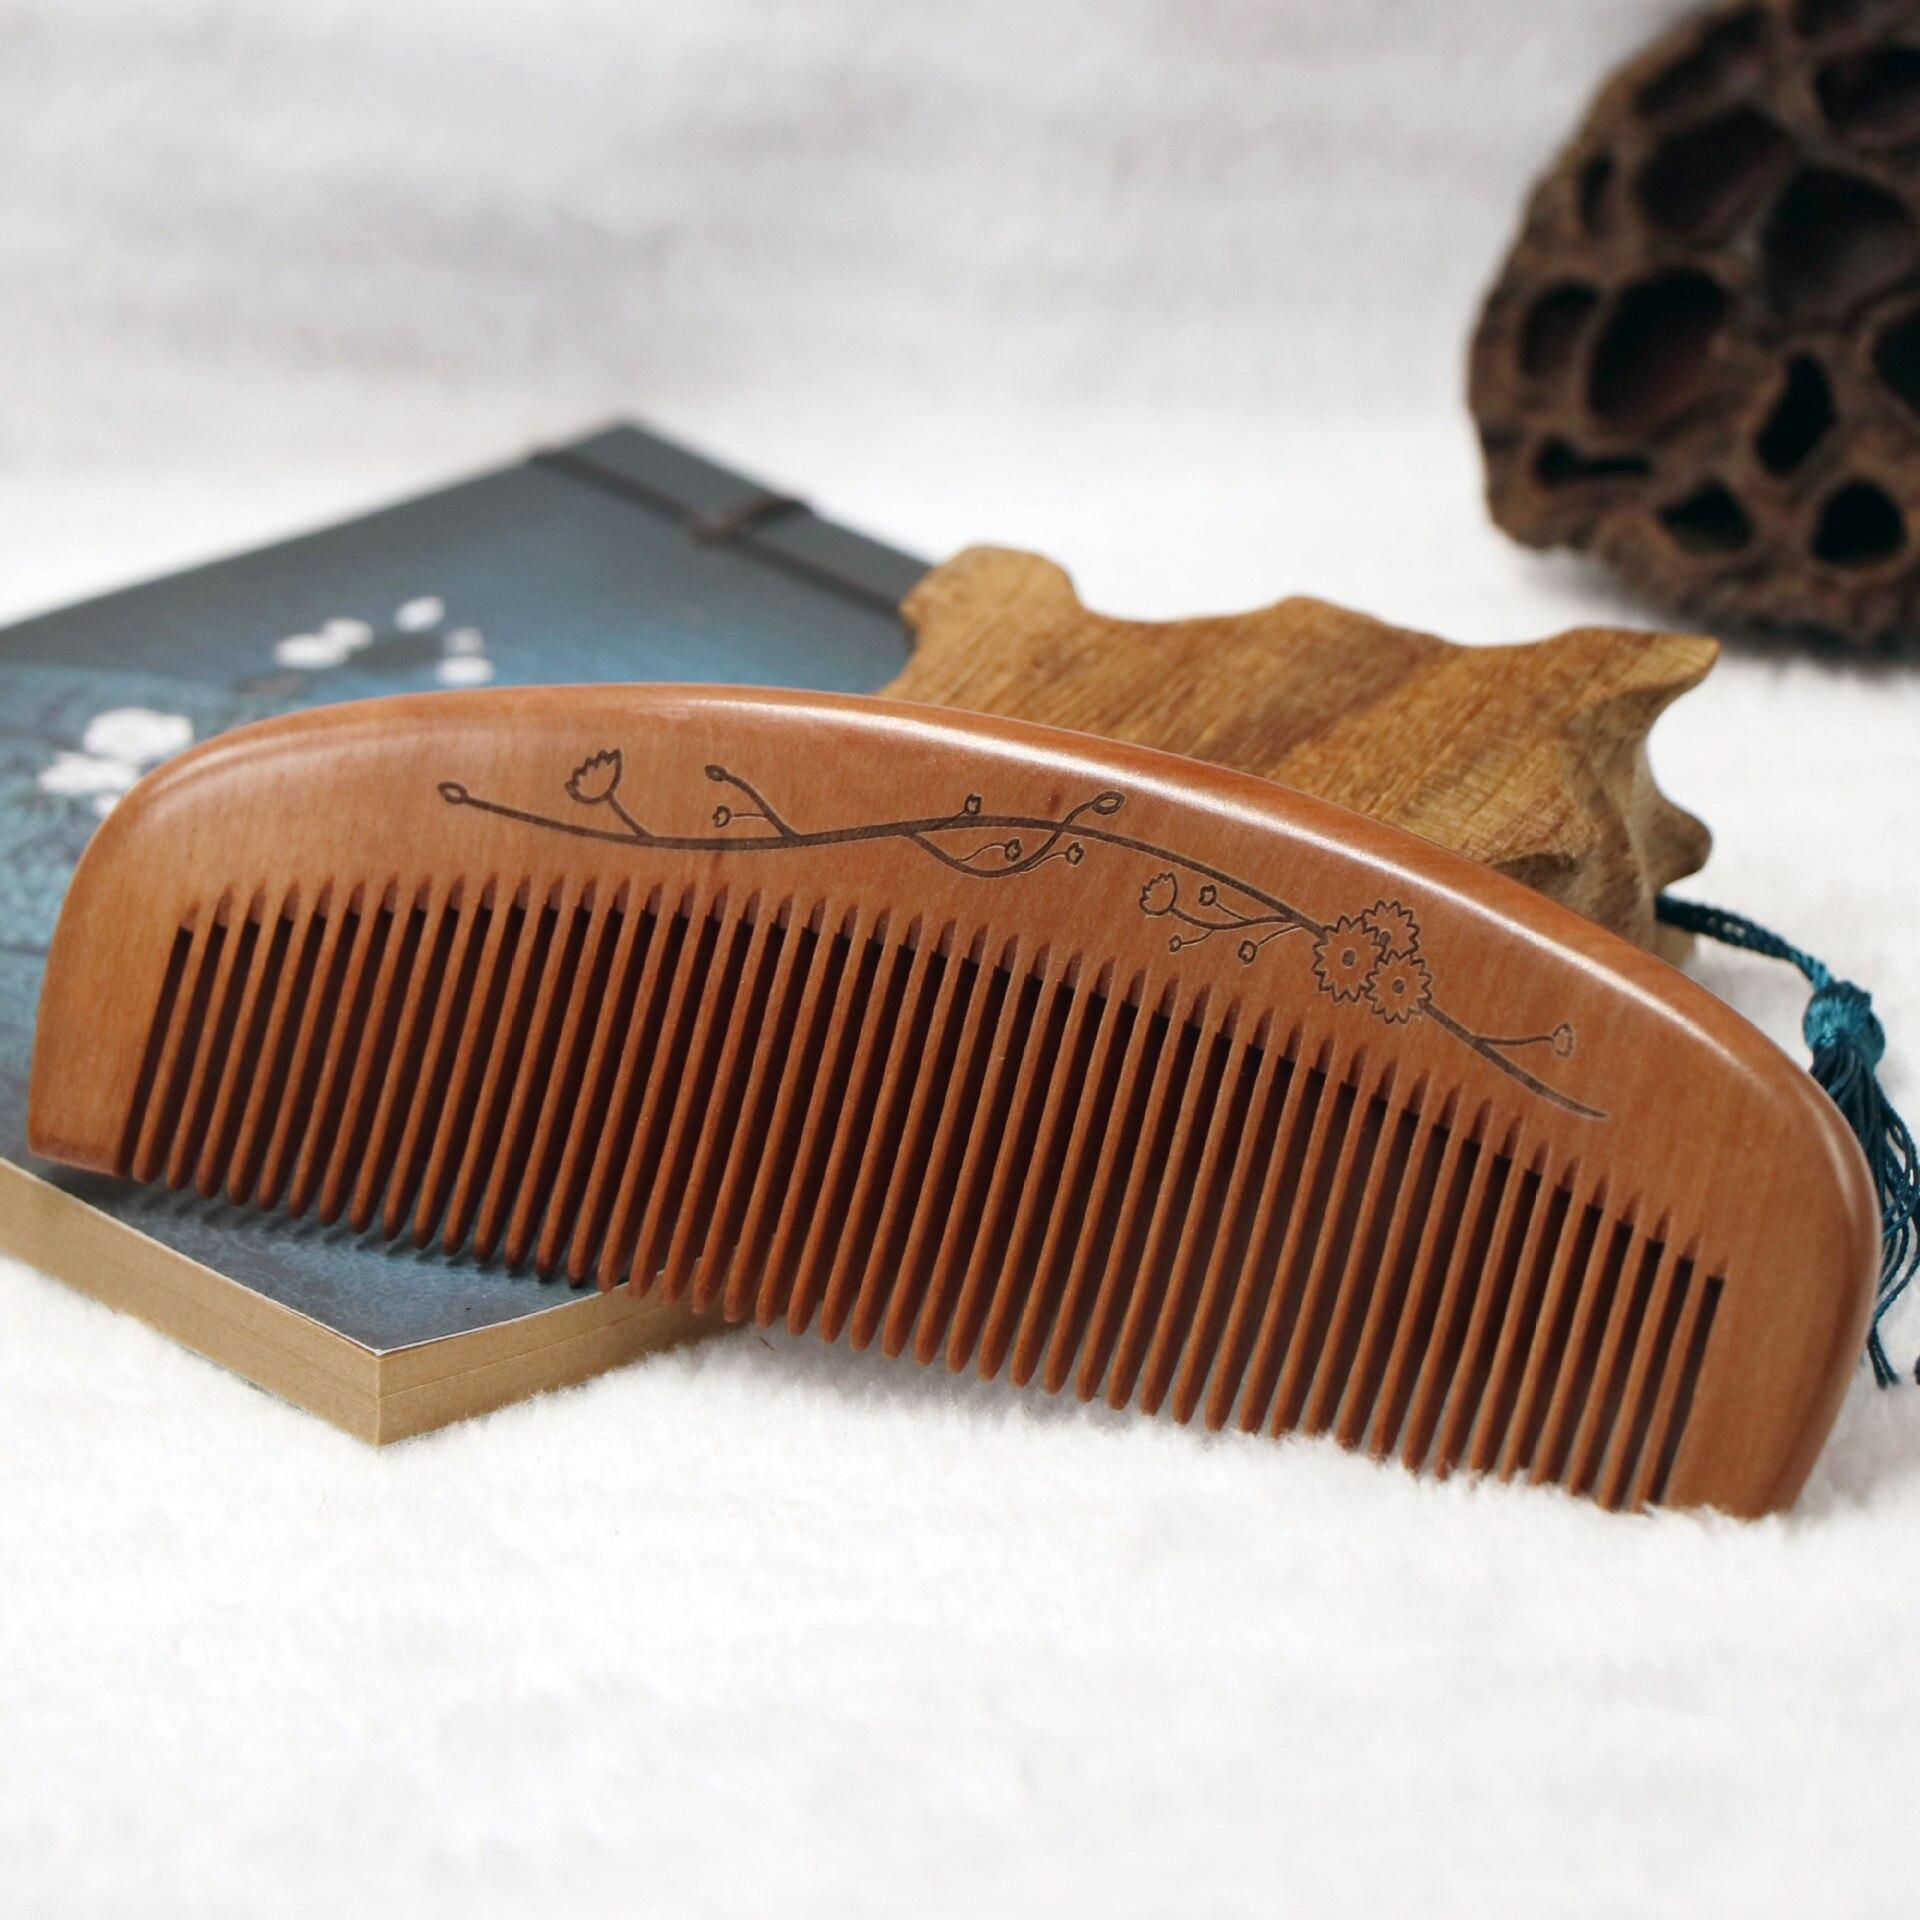 TI25 Fine old mahogany comb sandalwood comb anti-static hair loss hair comb c62 anti static peach wood comb sandalwood wide tooth comb hair comb